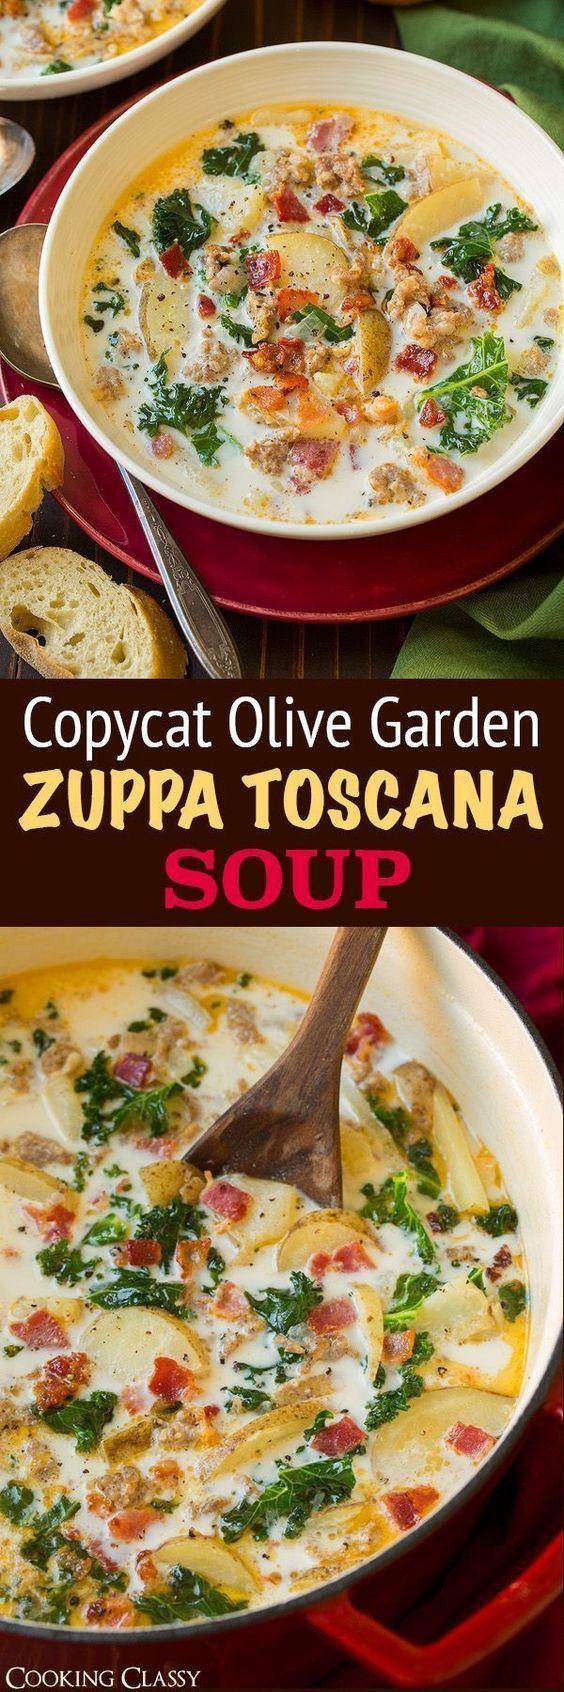 Crockpot chicken gnocchi soup (Olive Garden copycat) | Recipe ...